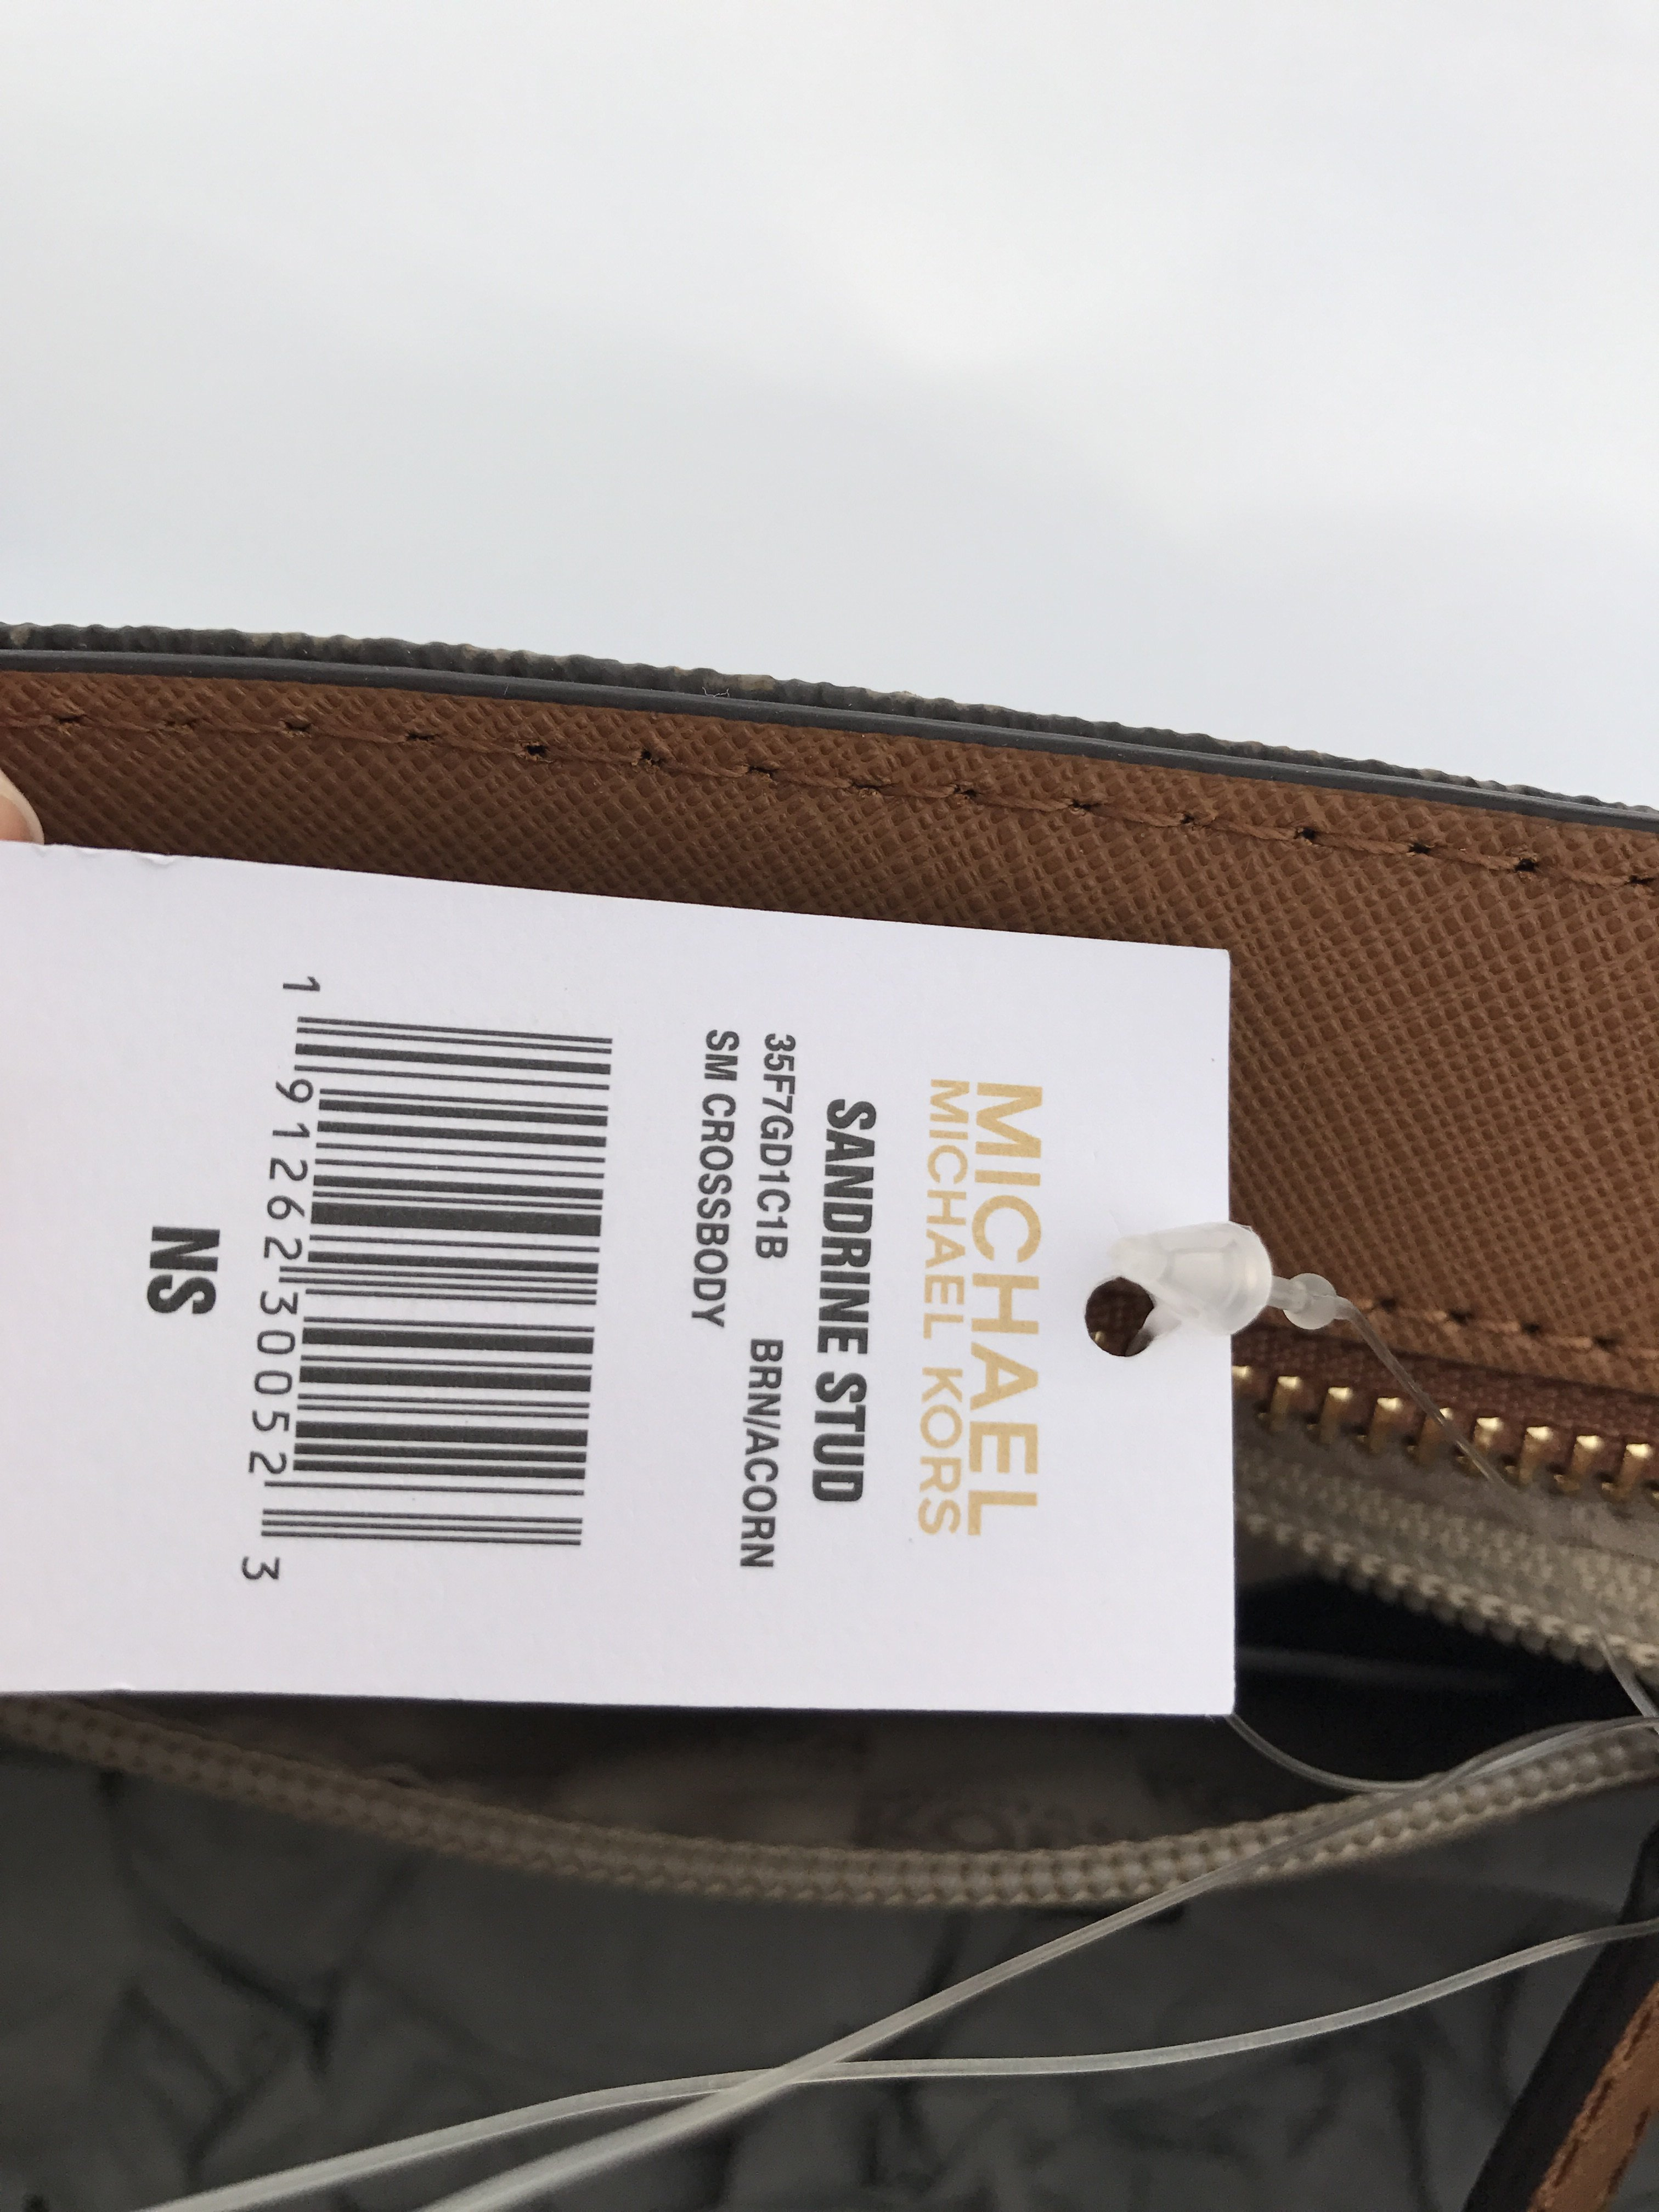 eed877d73b Michael Kors - Michael Kors Sandrine Pyramid Stud Mini Tote Crossbody Bag  Brown MK Signature - Walmart.com